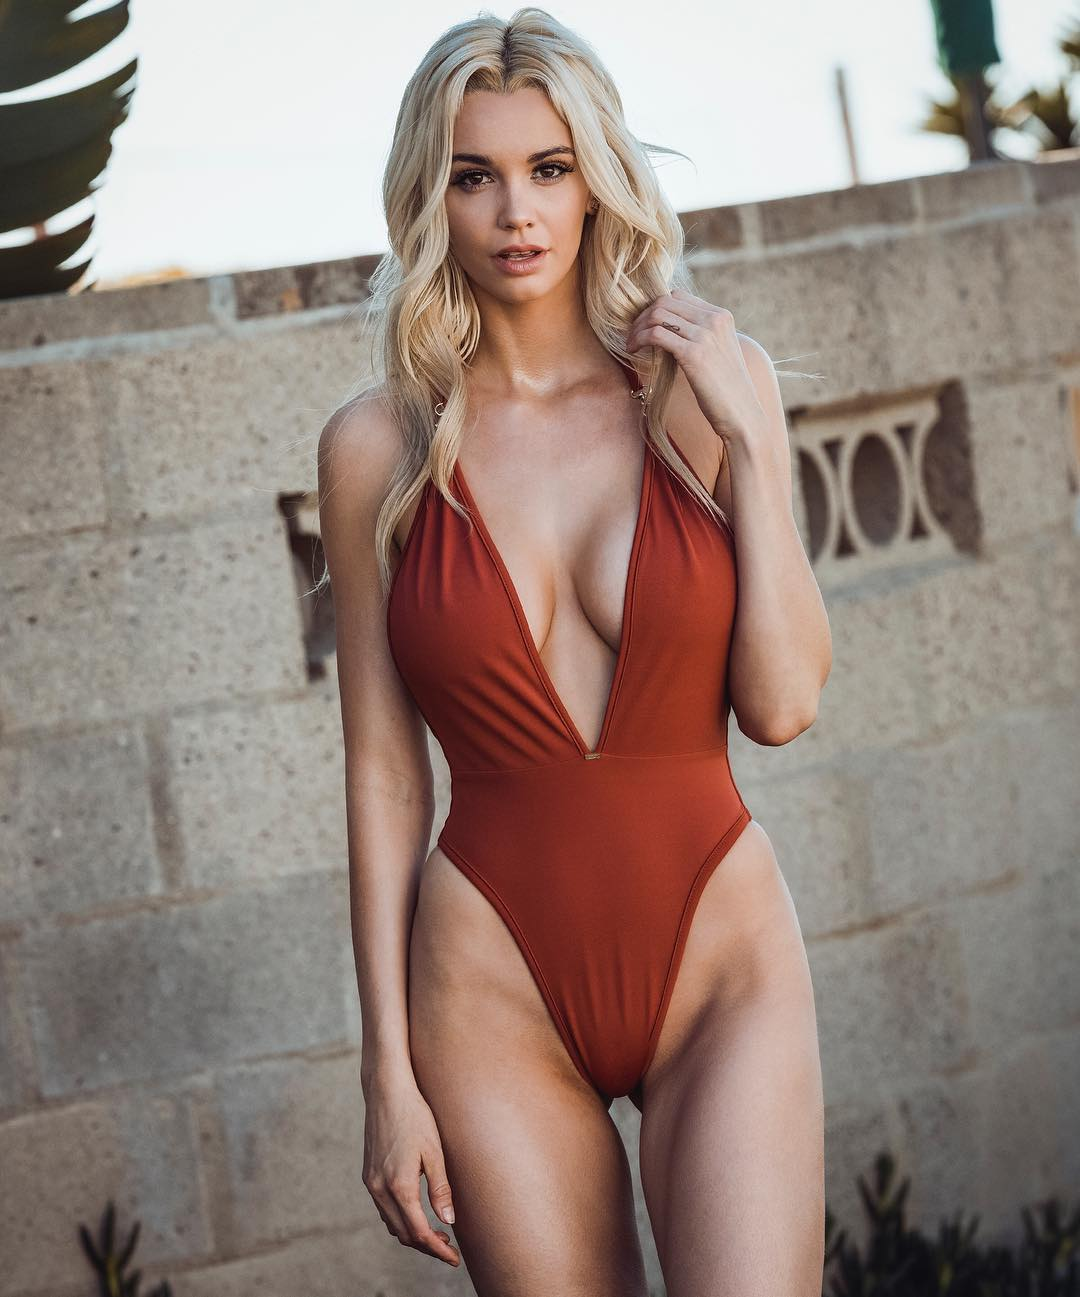 Ass Pics Caitlin Arnett naked photo 2017